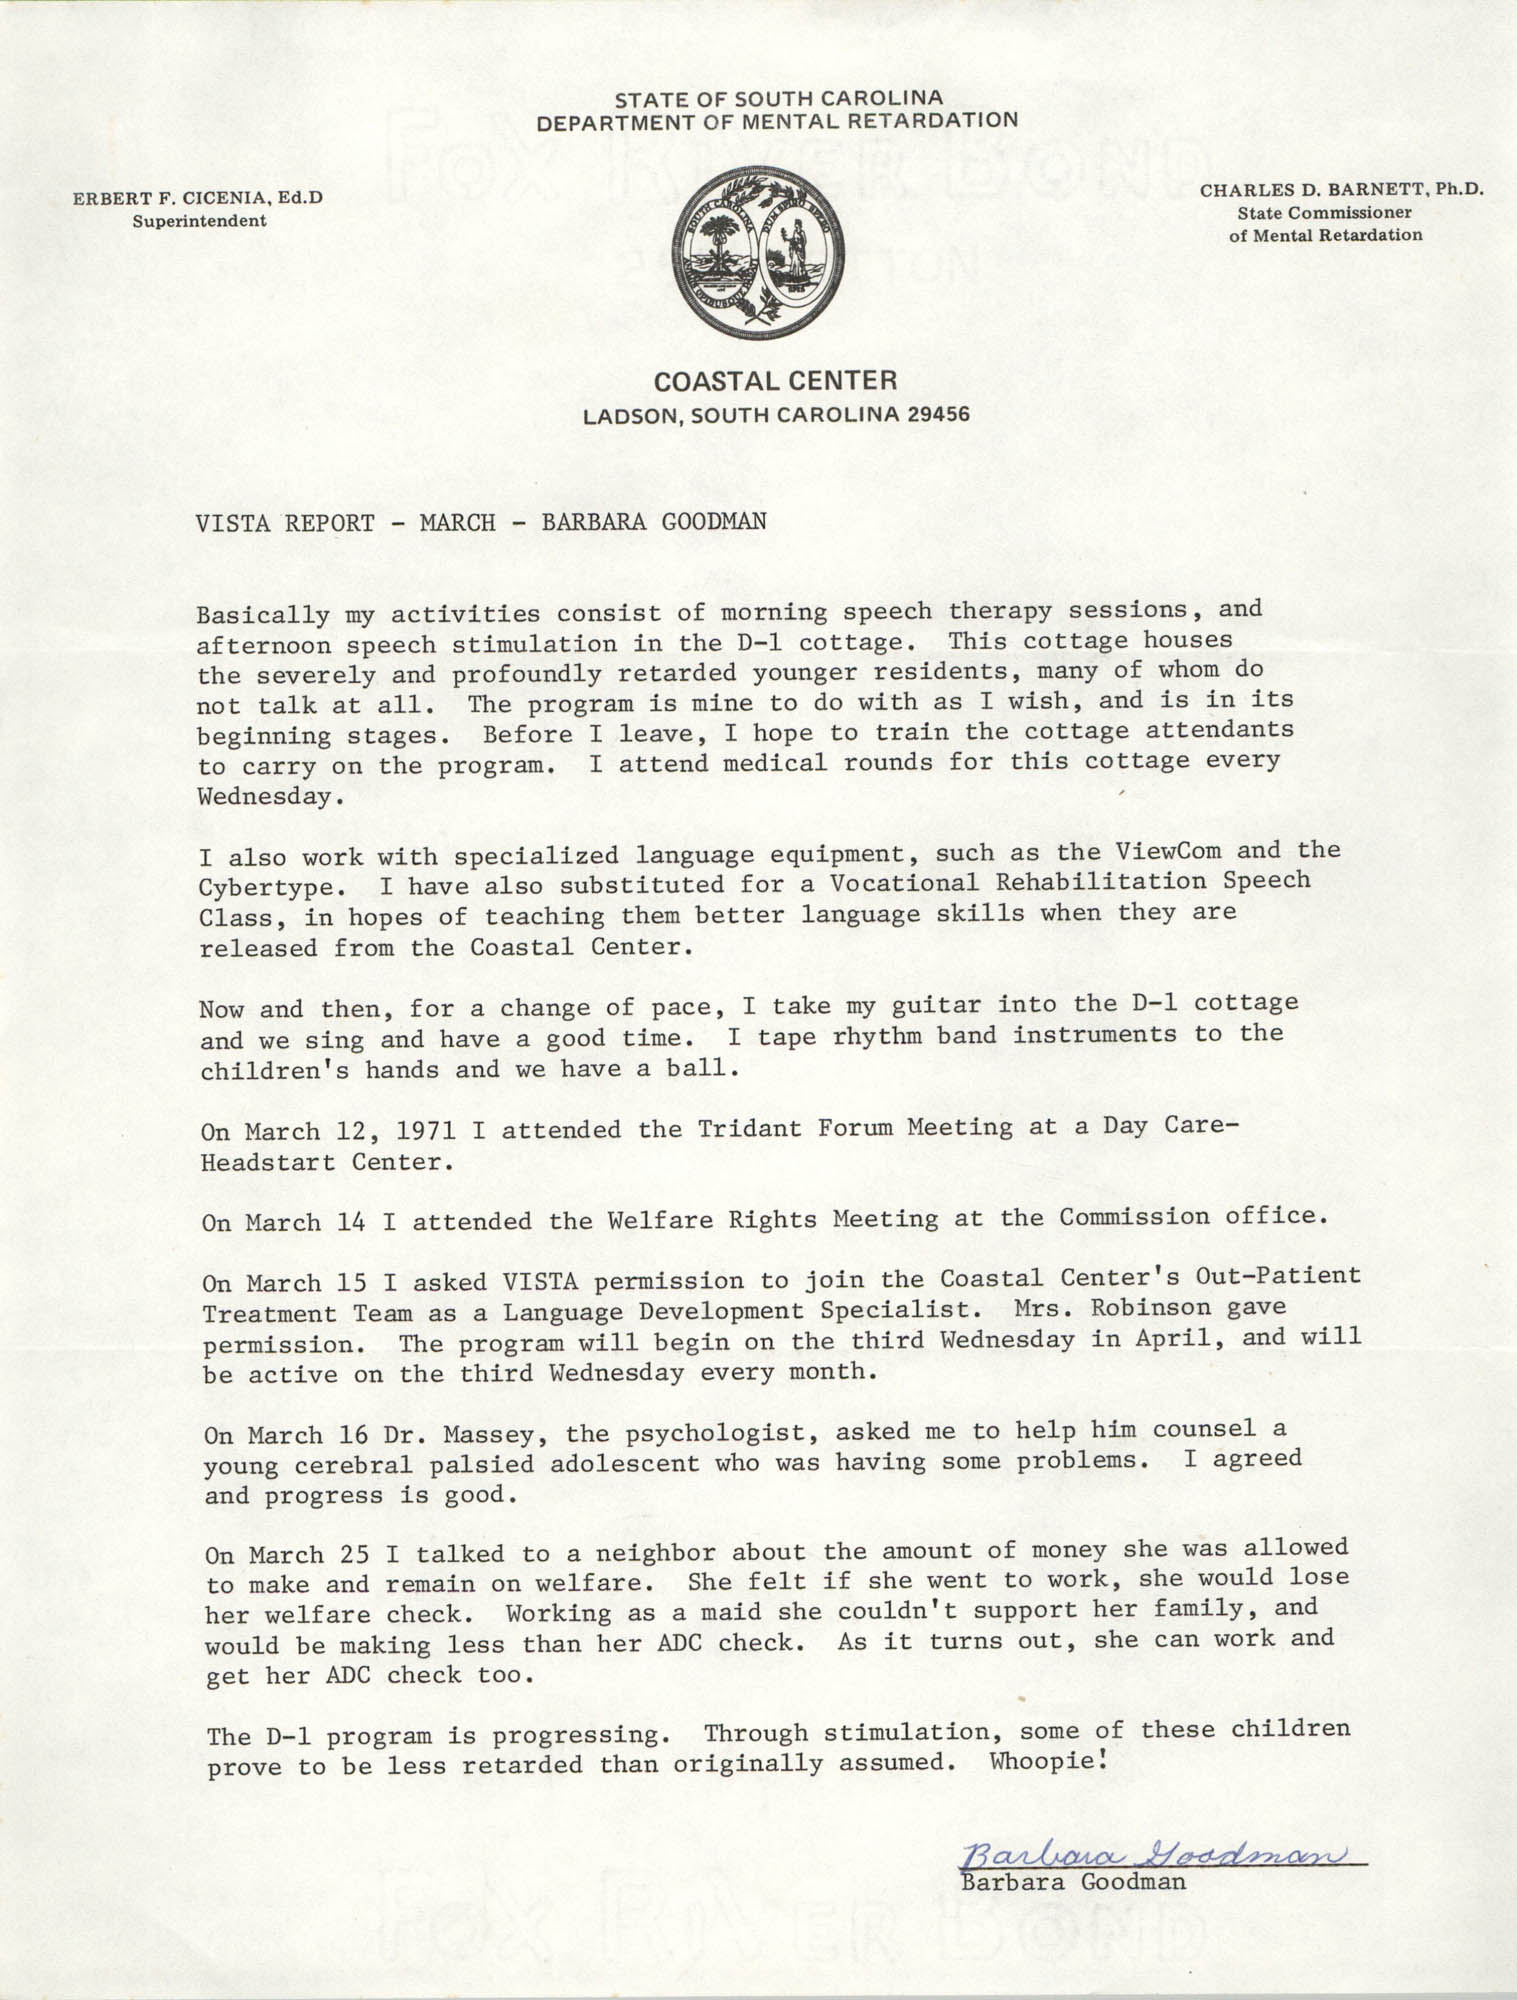 VISTA Report, March 1971